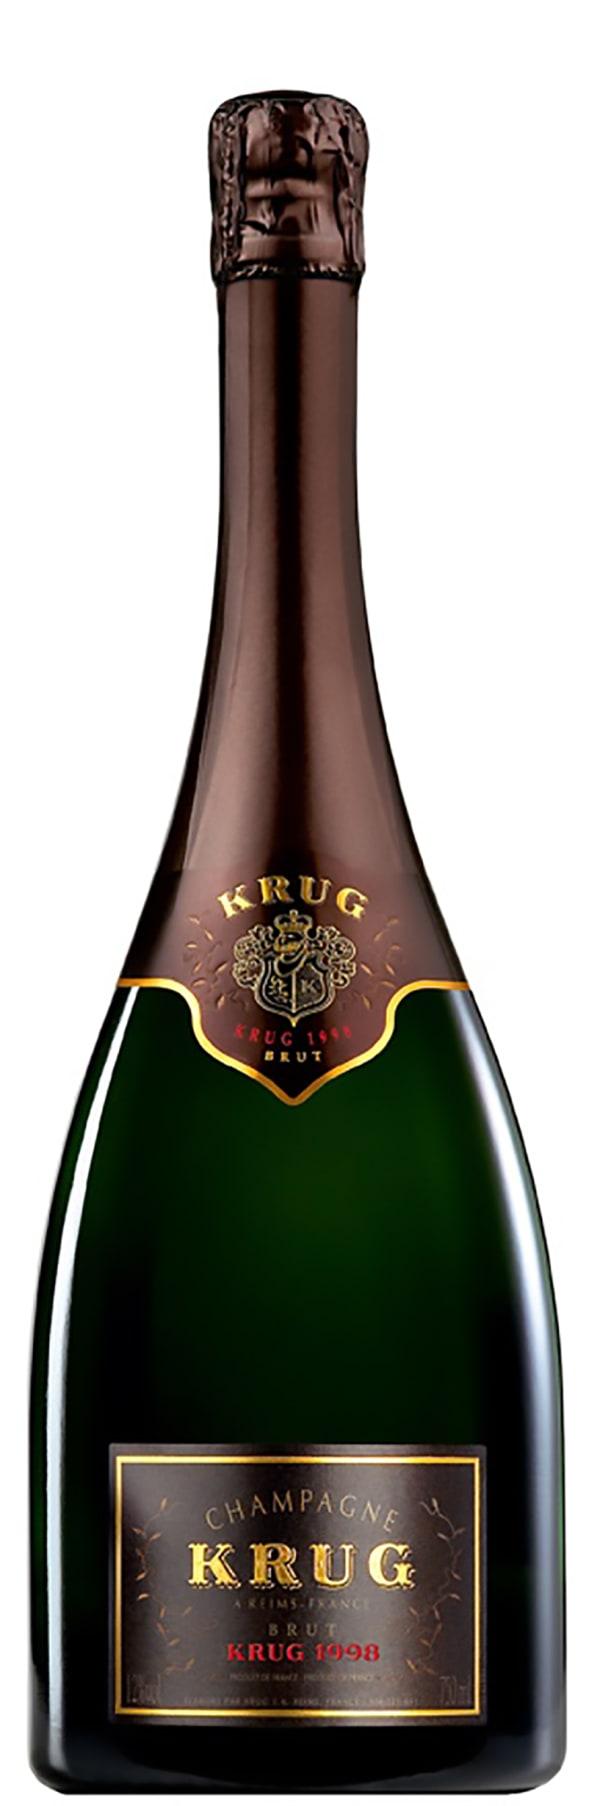 Krug Champagne Brut 1998